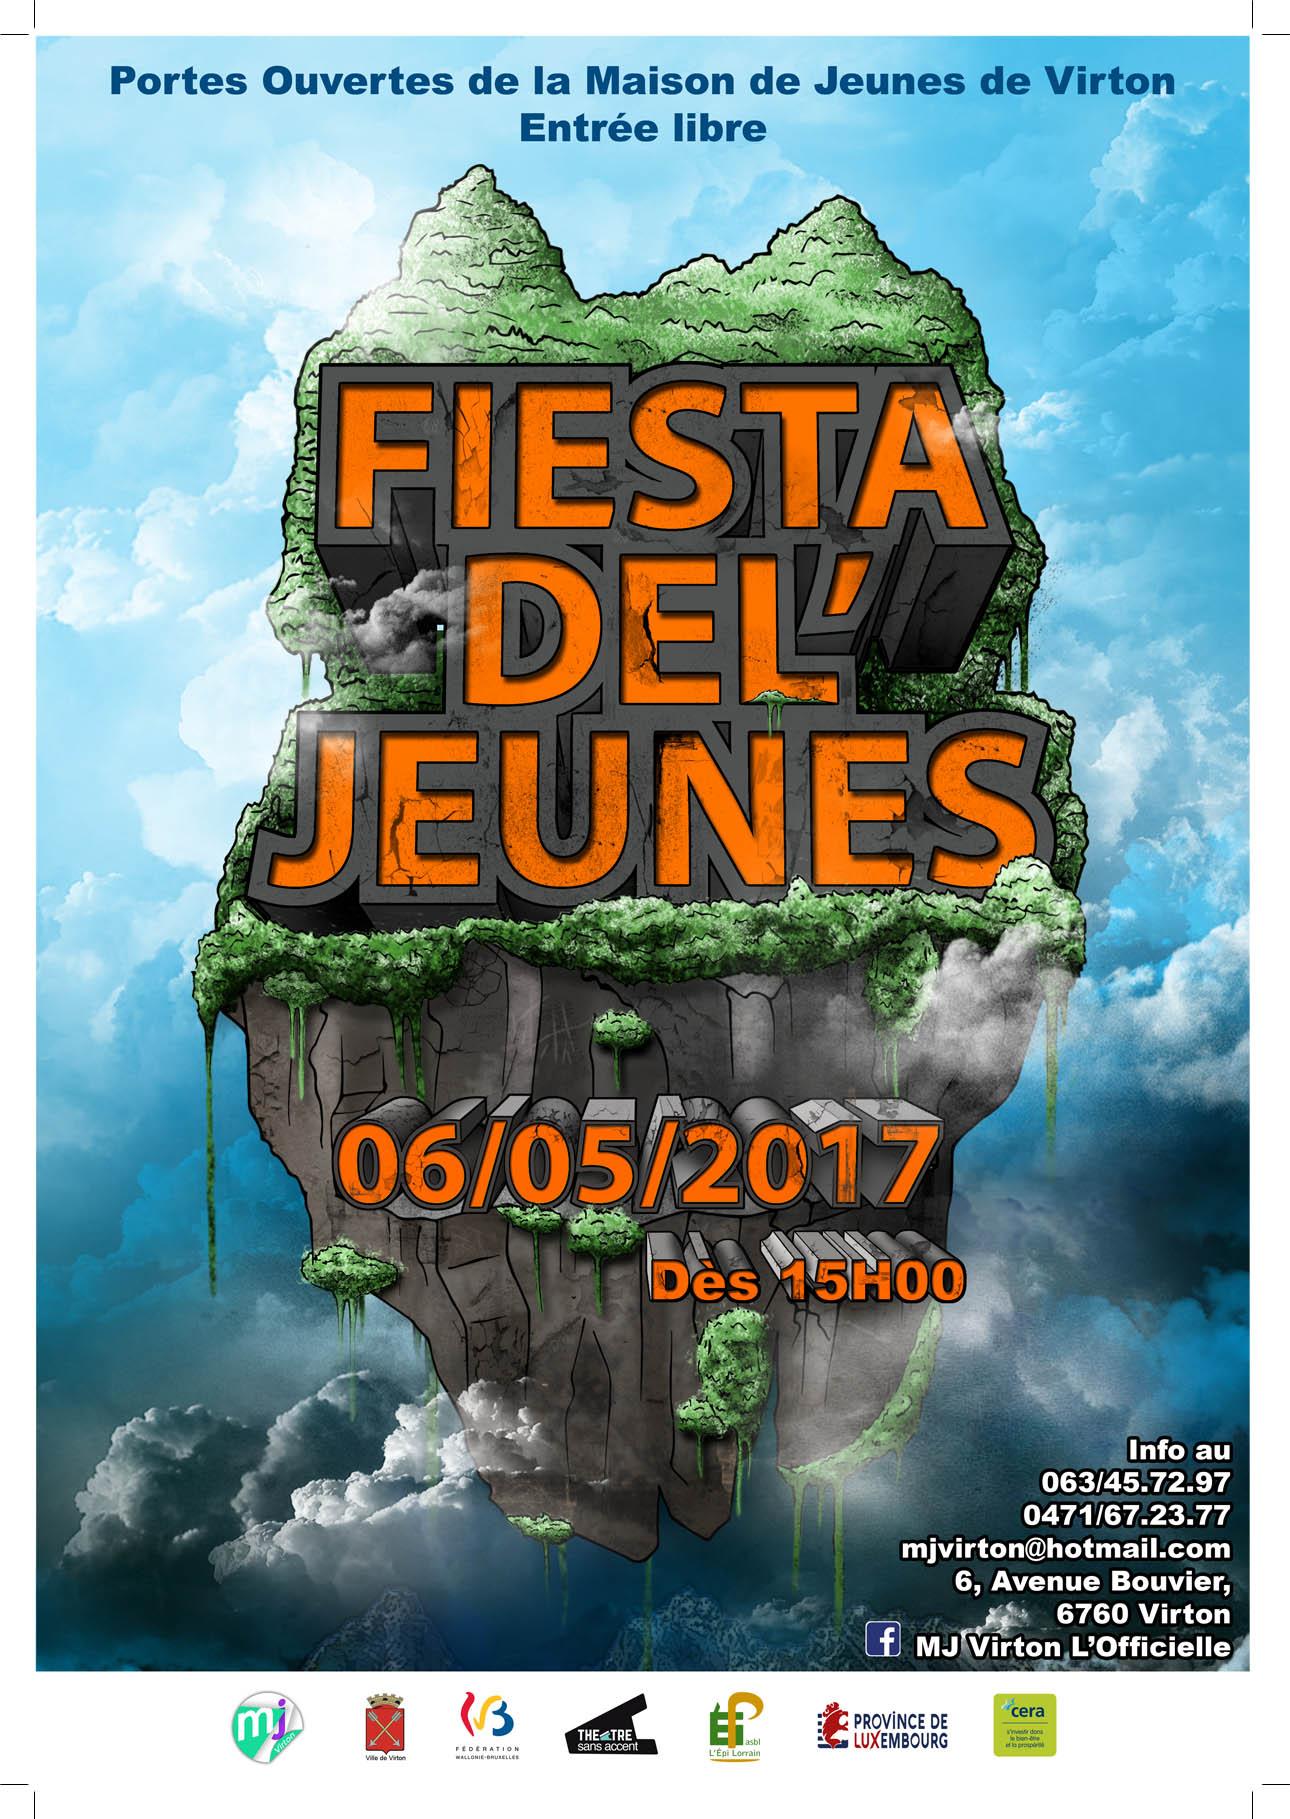 la « Fiesta Del'Jeunes » à Virton